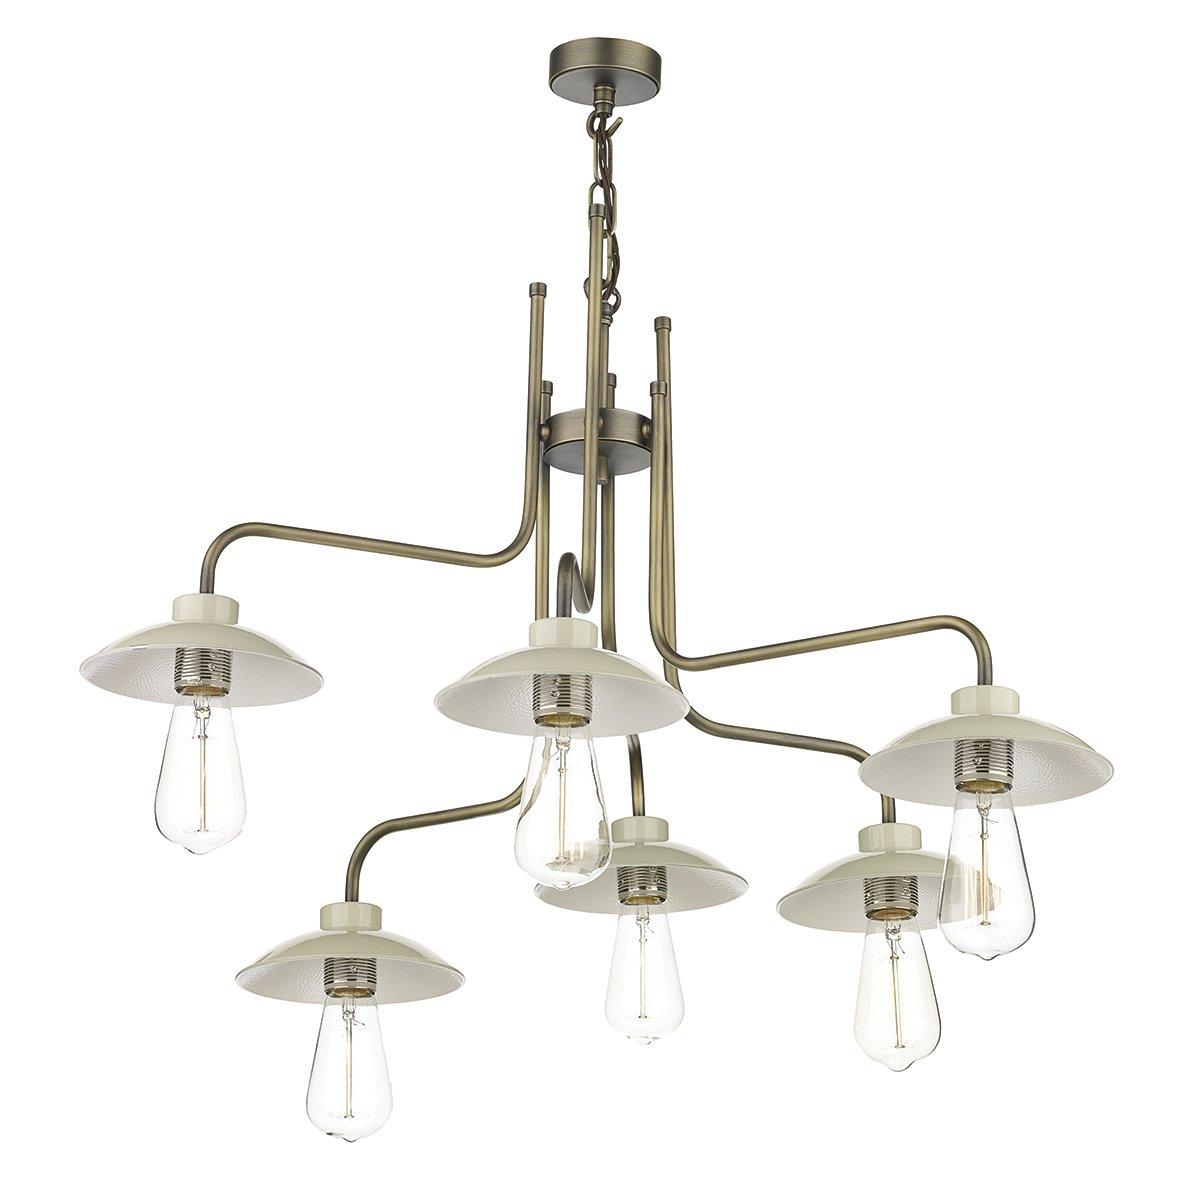 David Hunt Lighting AXE0633 Axel 6 Light Pendant Antique Brass